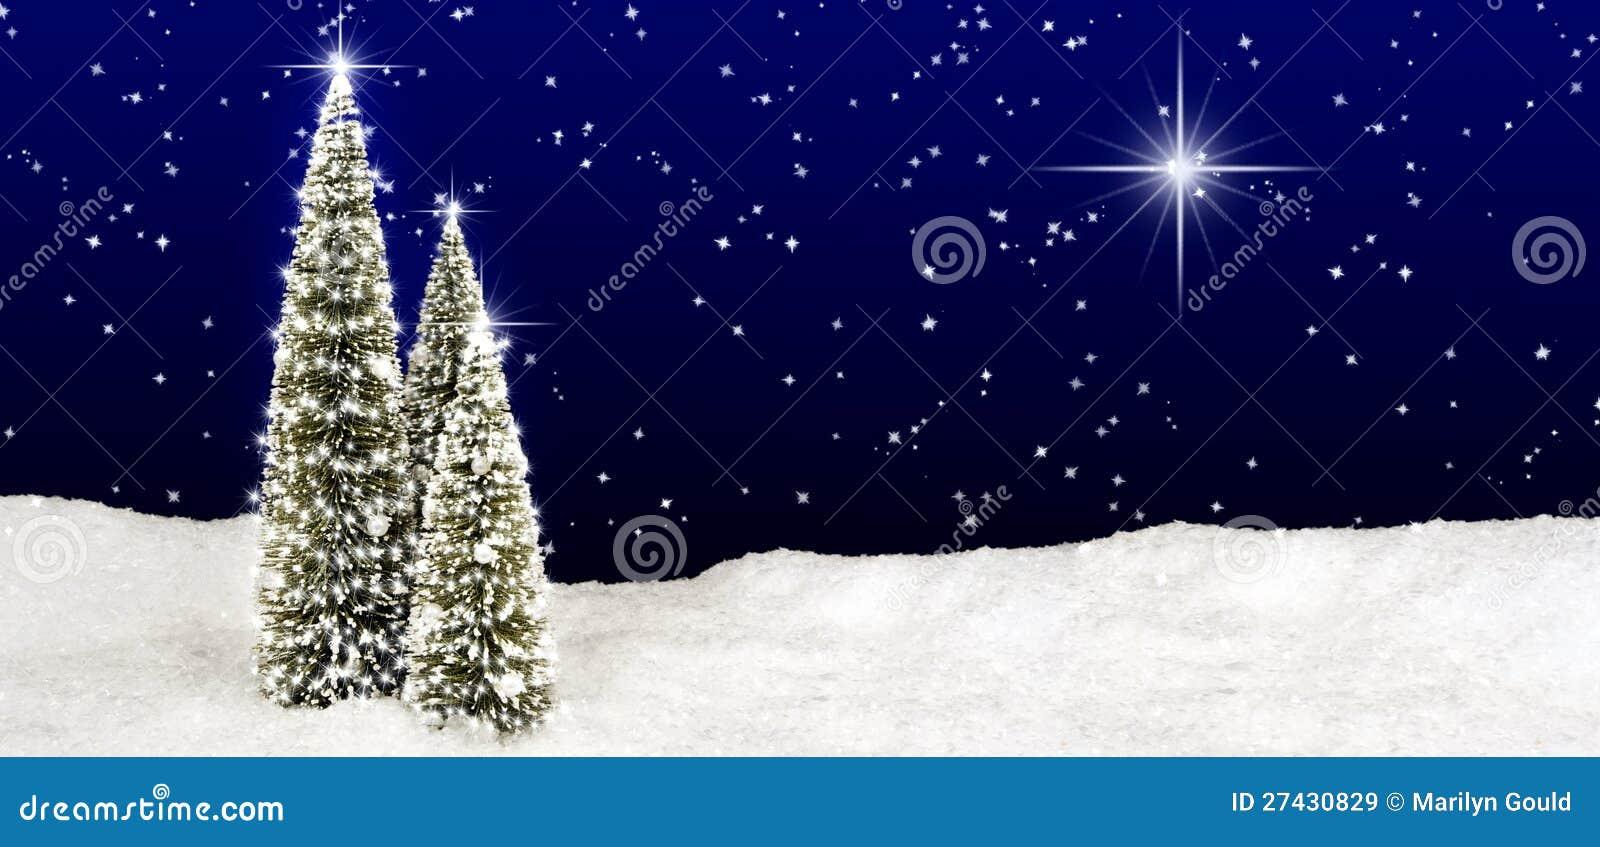 Christmas Trees Star Sky